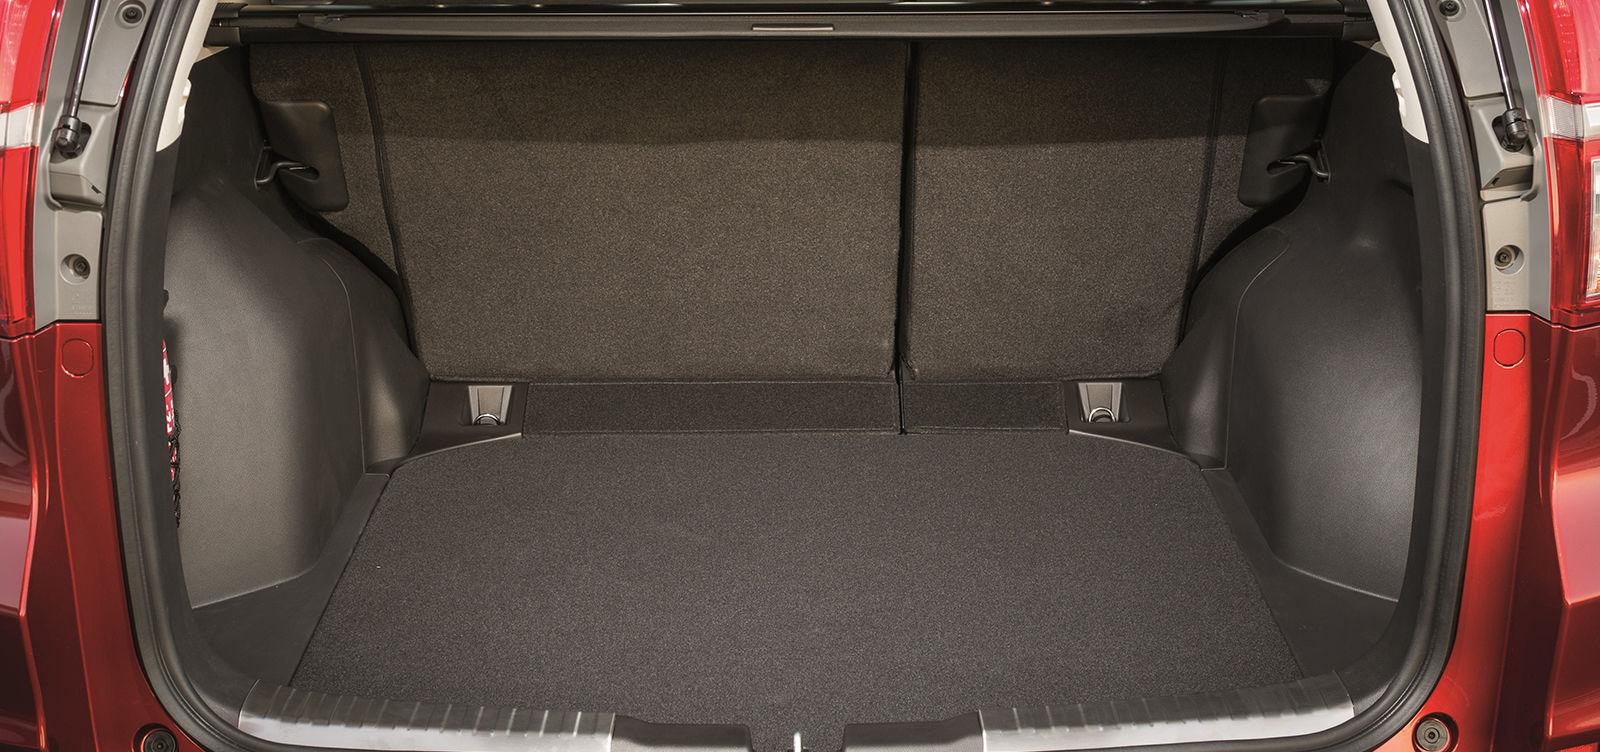 honda crv boot dimensions car insurance info. Black Bedroom Furniture Sets. Home Design Ideas